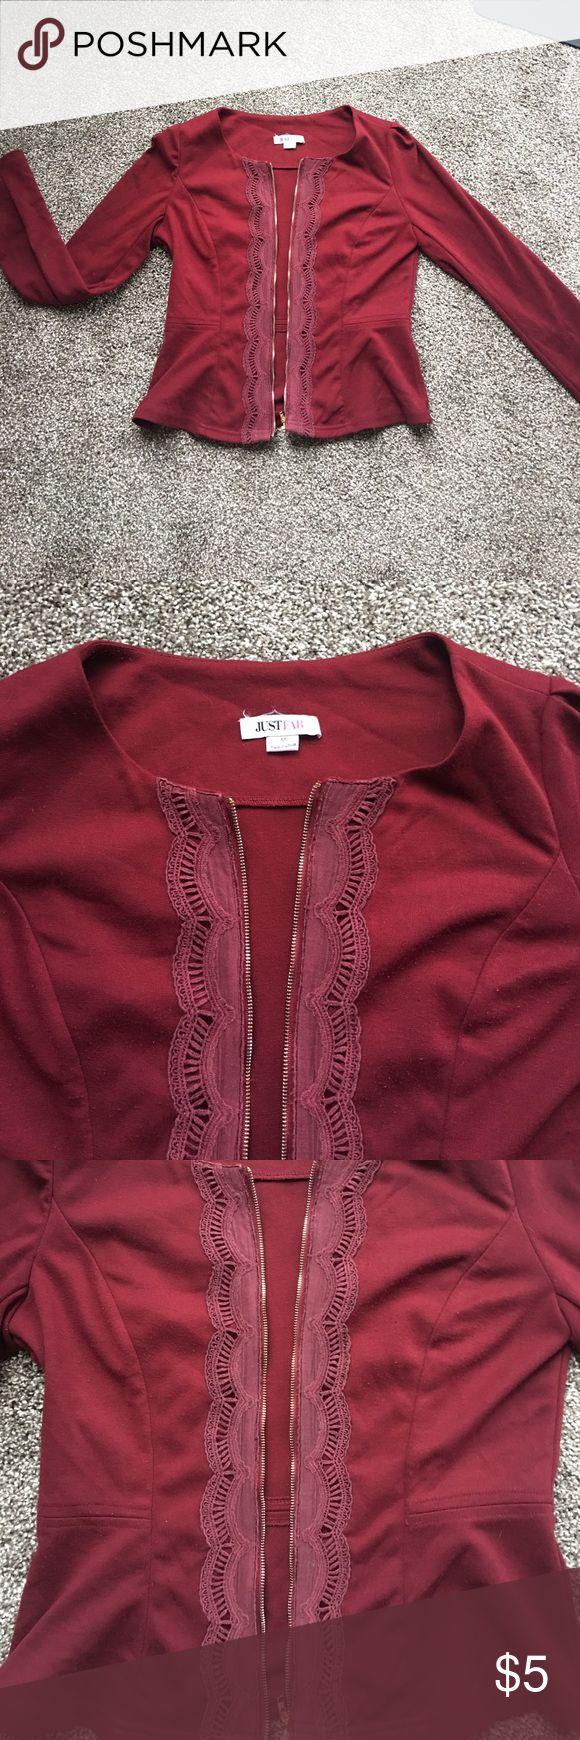 Maroon blazer Used. From JustFab. Size medium but fits like a small JustFab Jackets & Coats Blazers